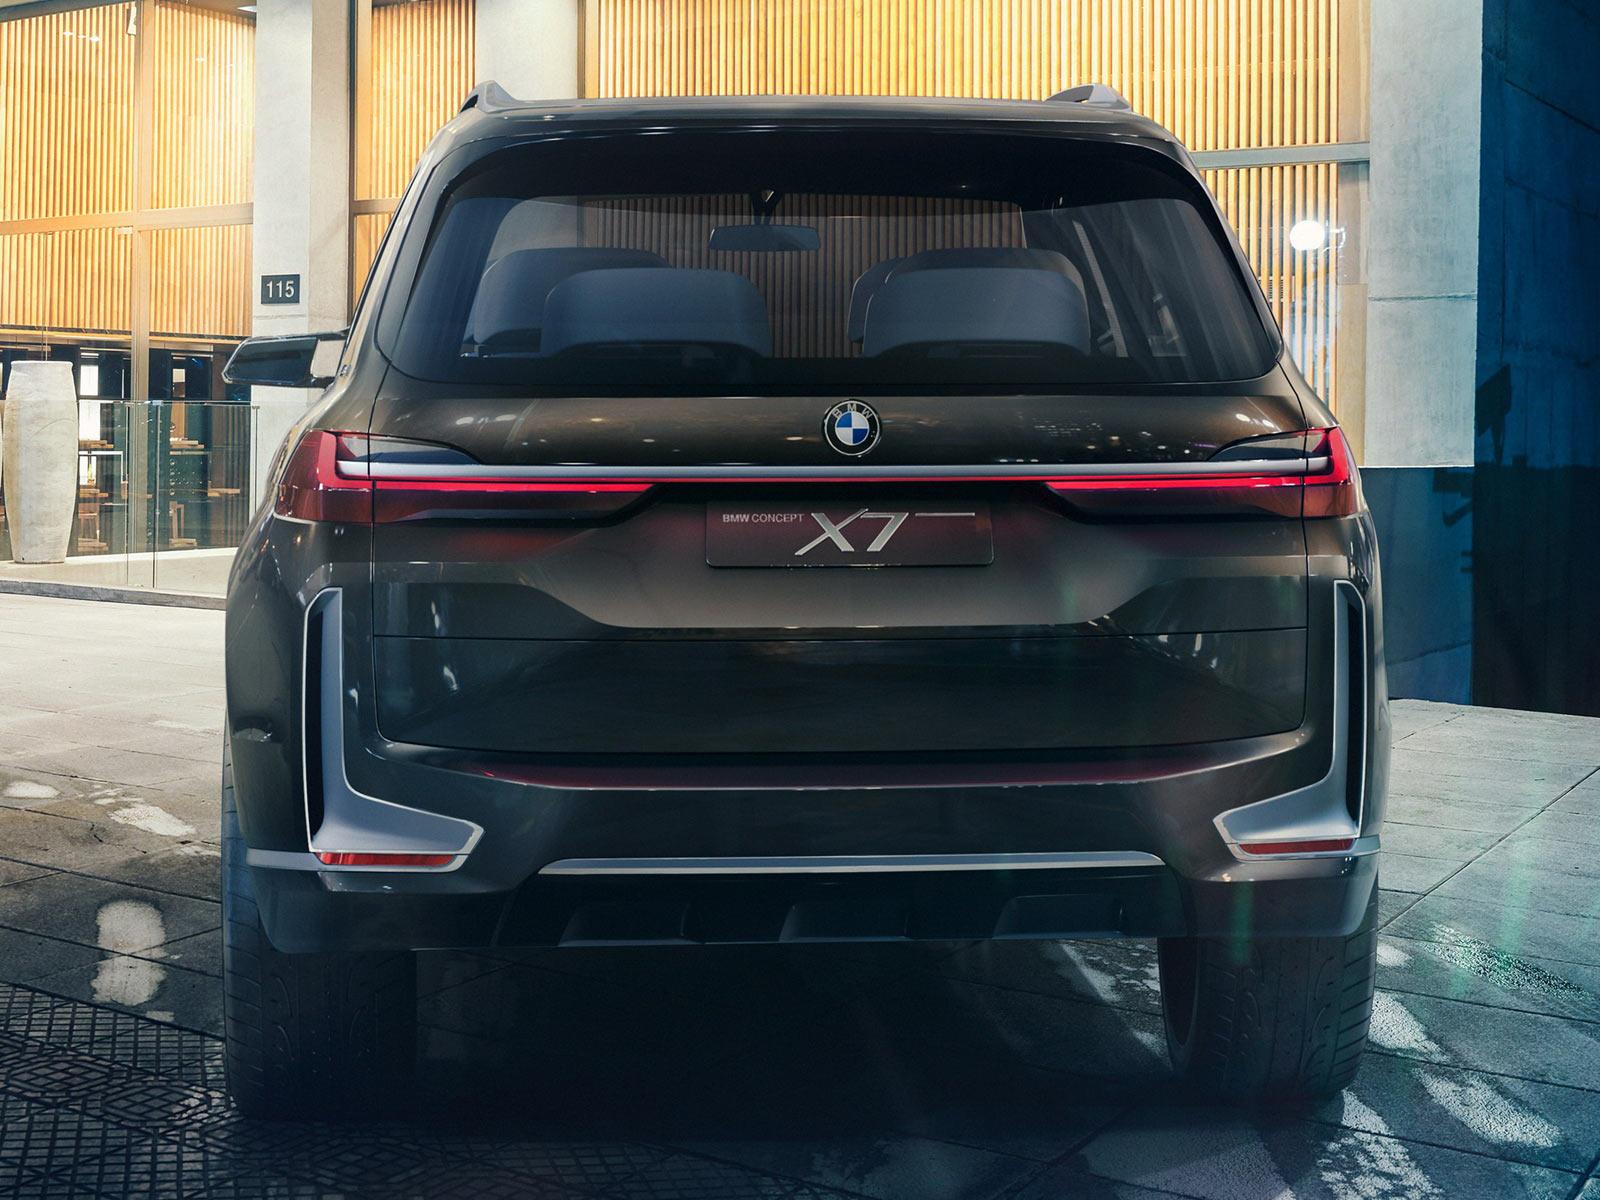 BMW-X7-Concept-4.jpg